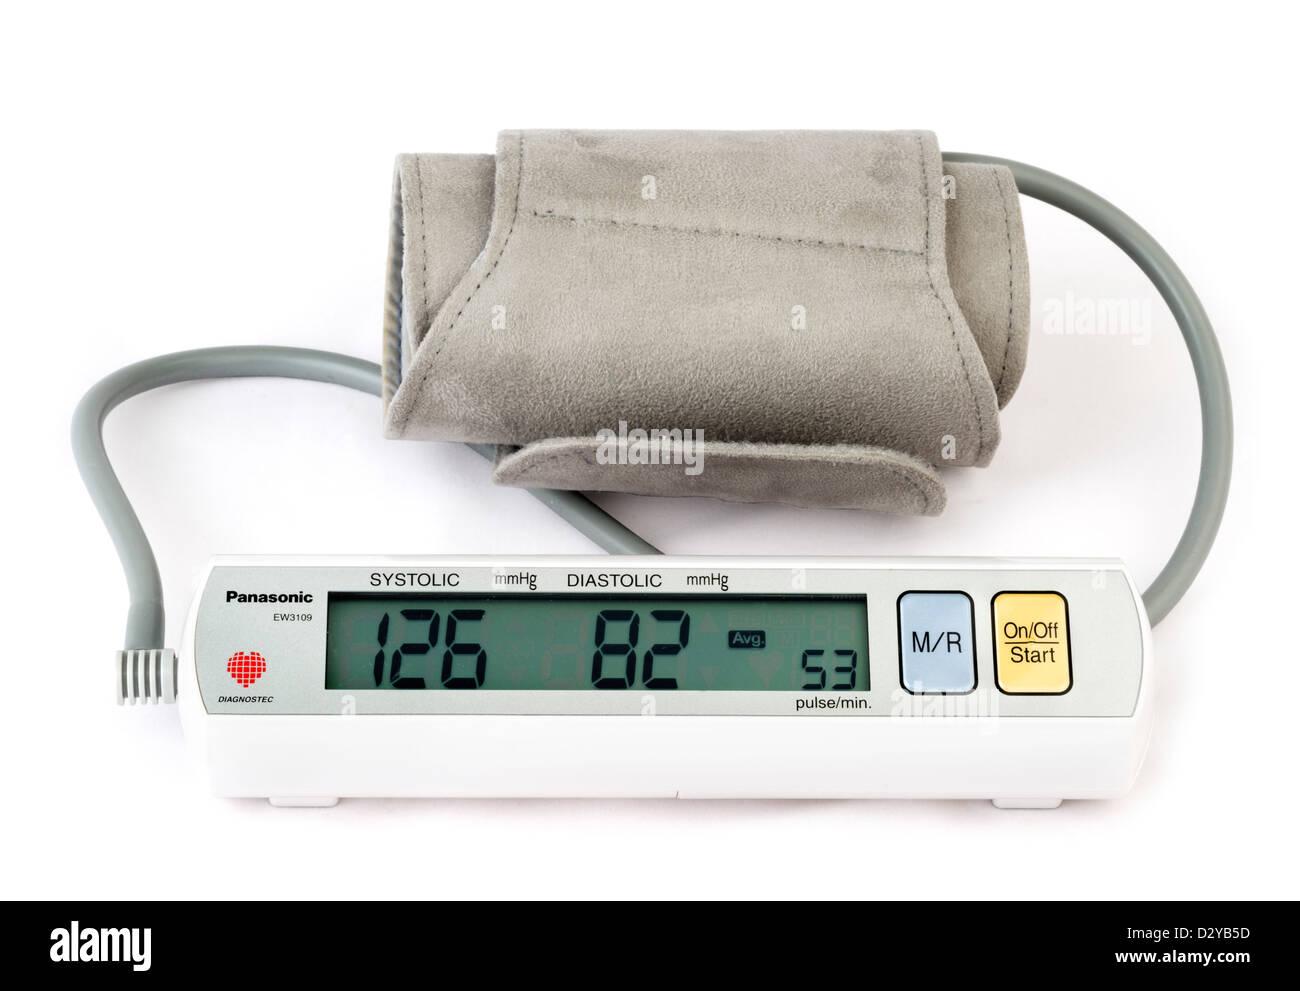 Panasonic Batterie betriebene home Blutdruckmessgerät Stockbild